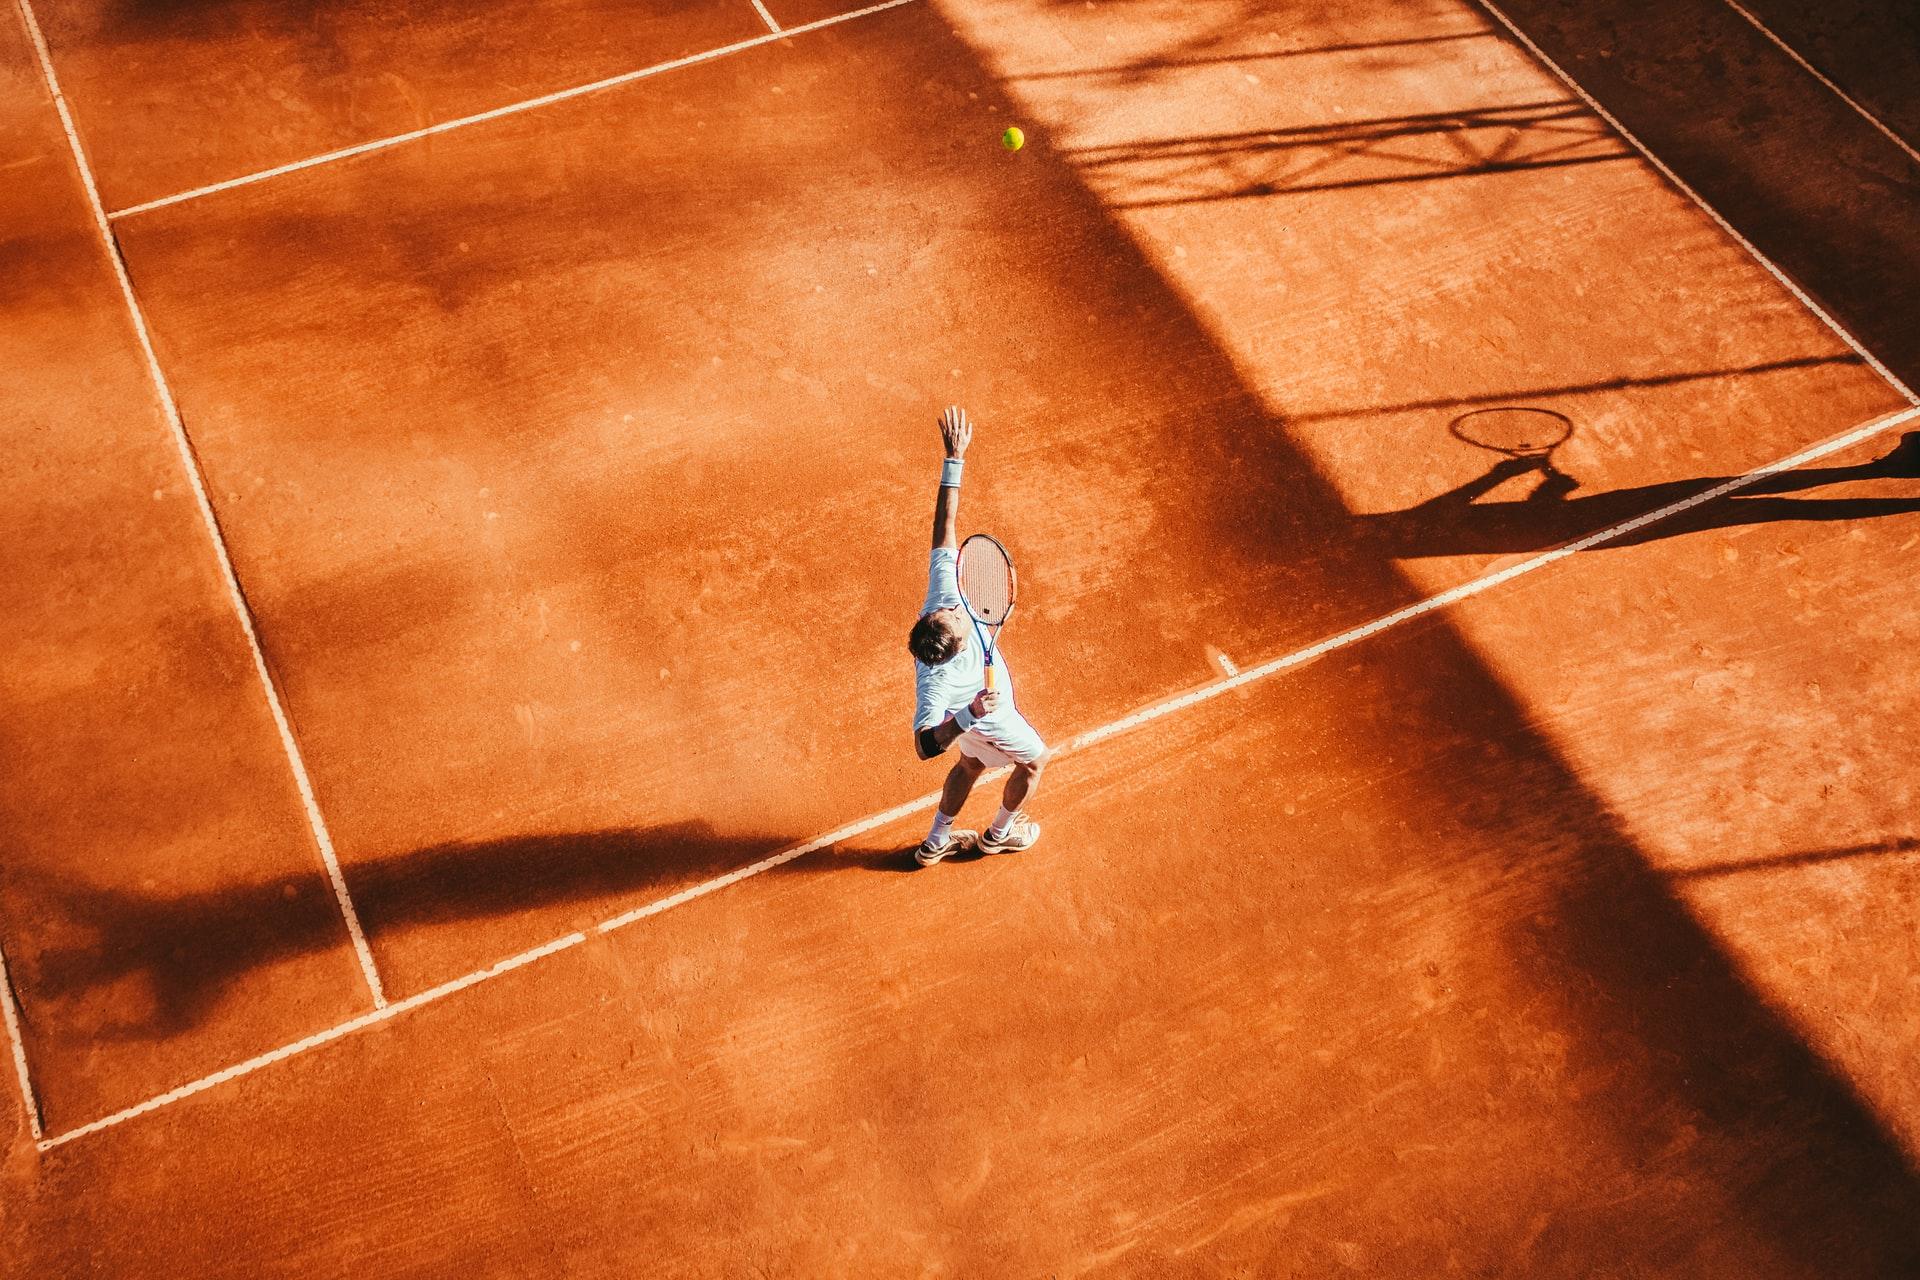 australian open men's singles betting tips